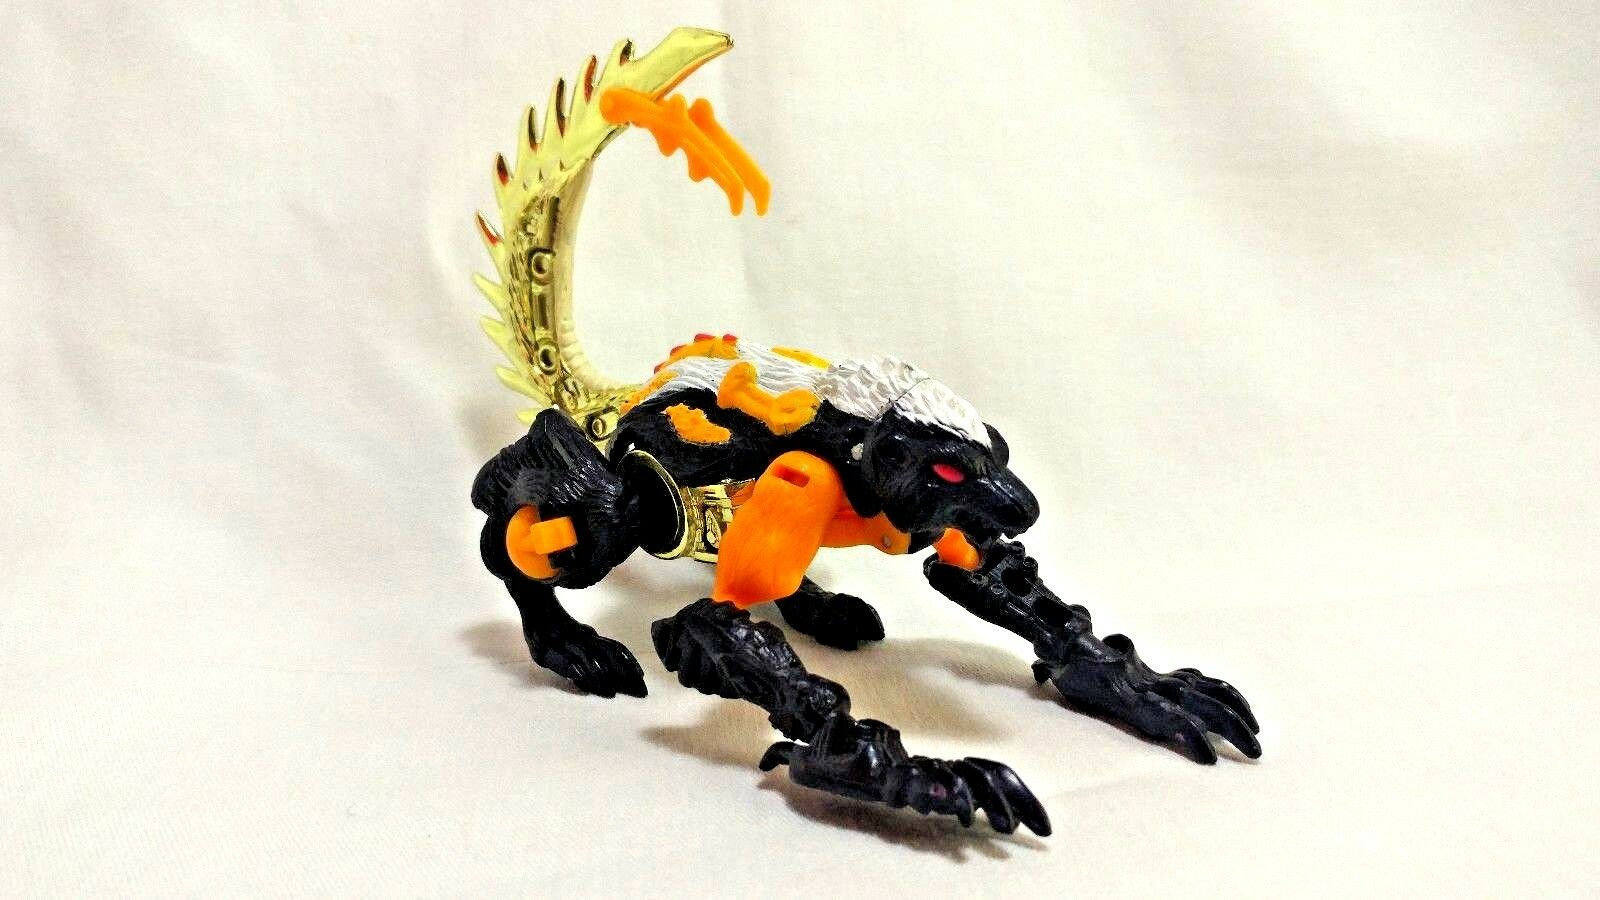 Transformers Human Alliance redF Lot 3 Skids Arcee Mikaela Action Figure EUC